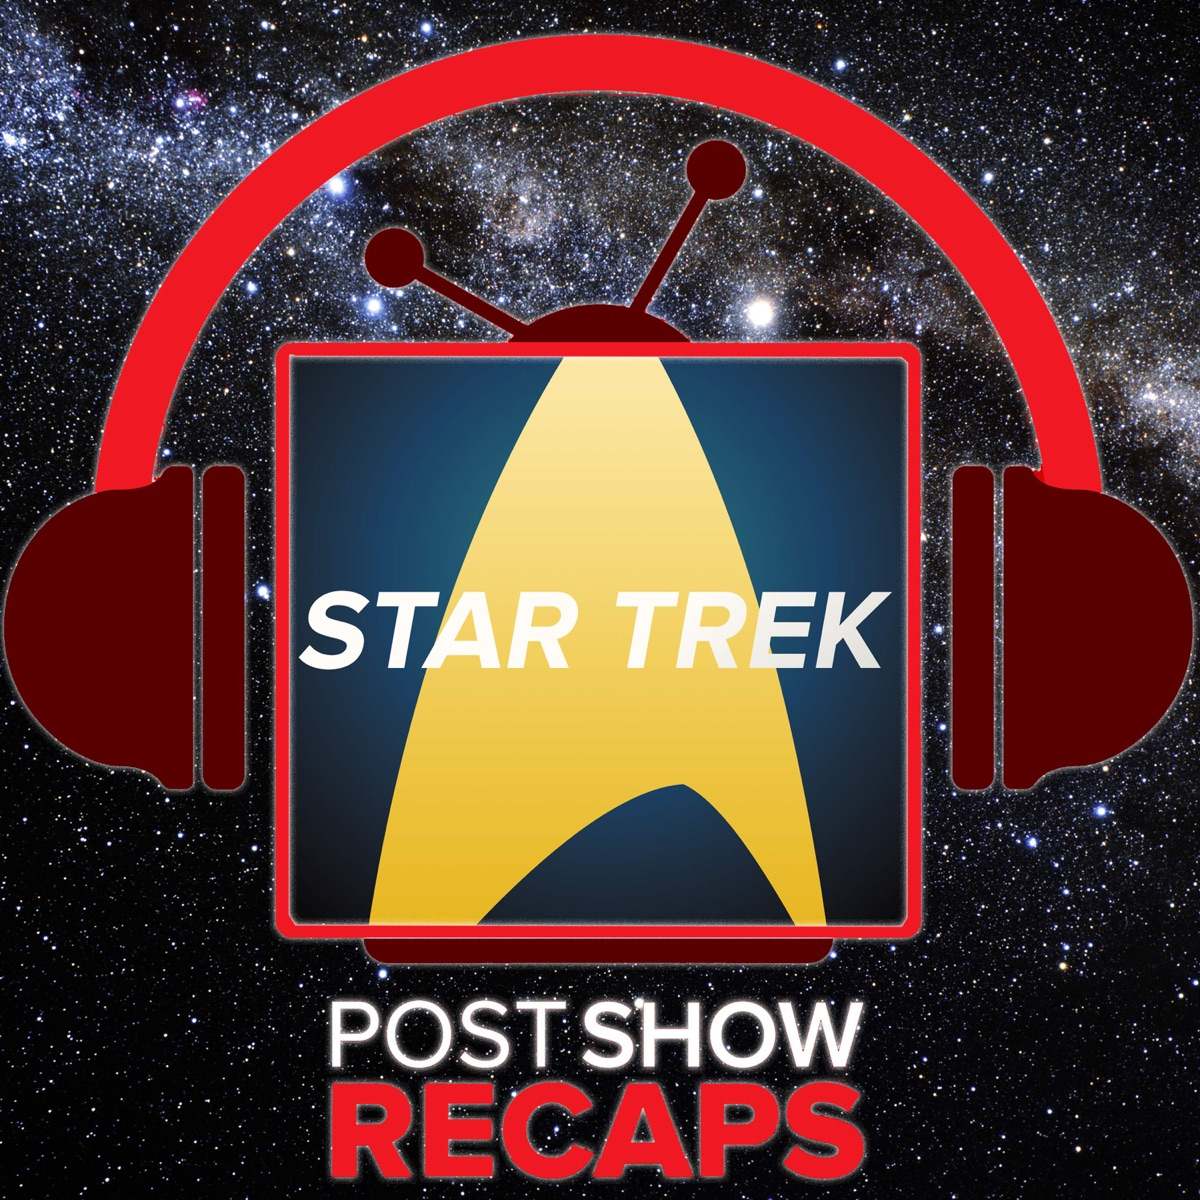 Star Trek Discovery The Post Show Recap Favorite Trek Episode Recaps Podcast Podtail